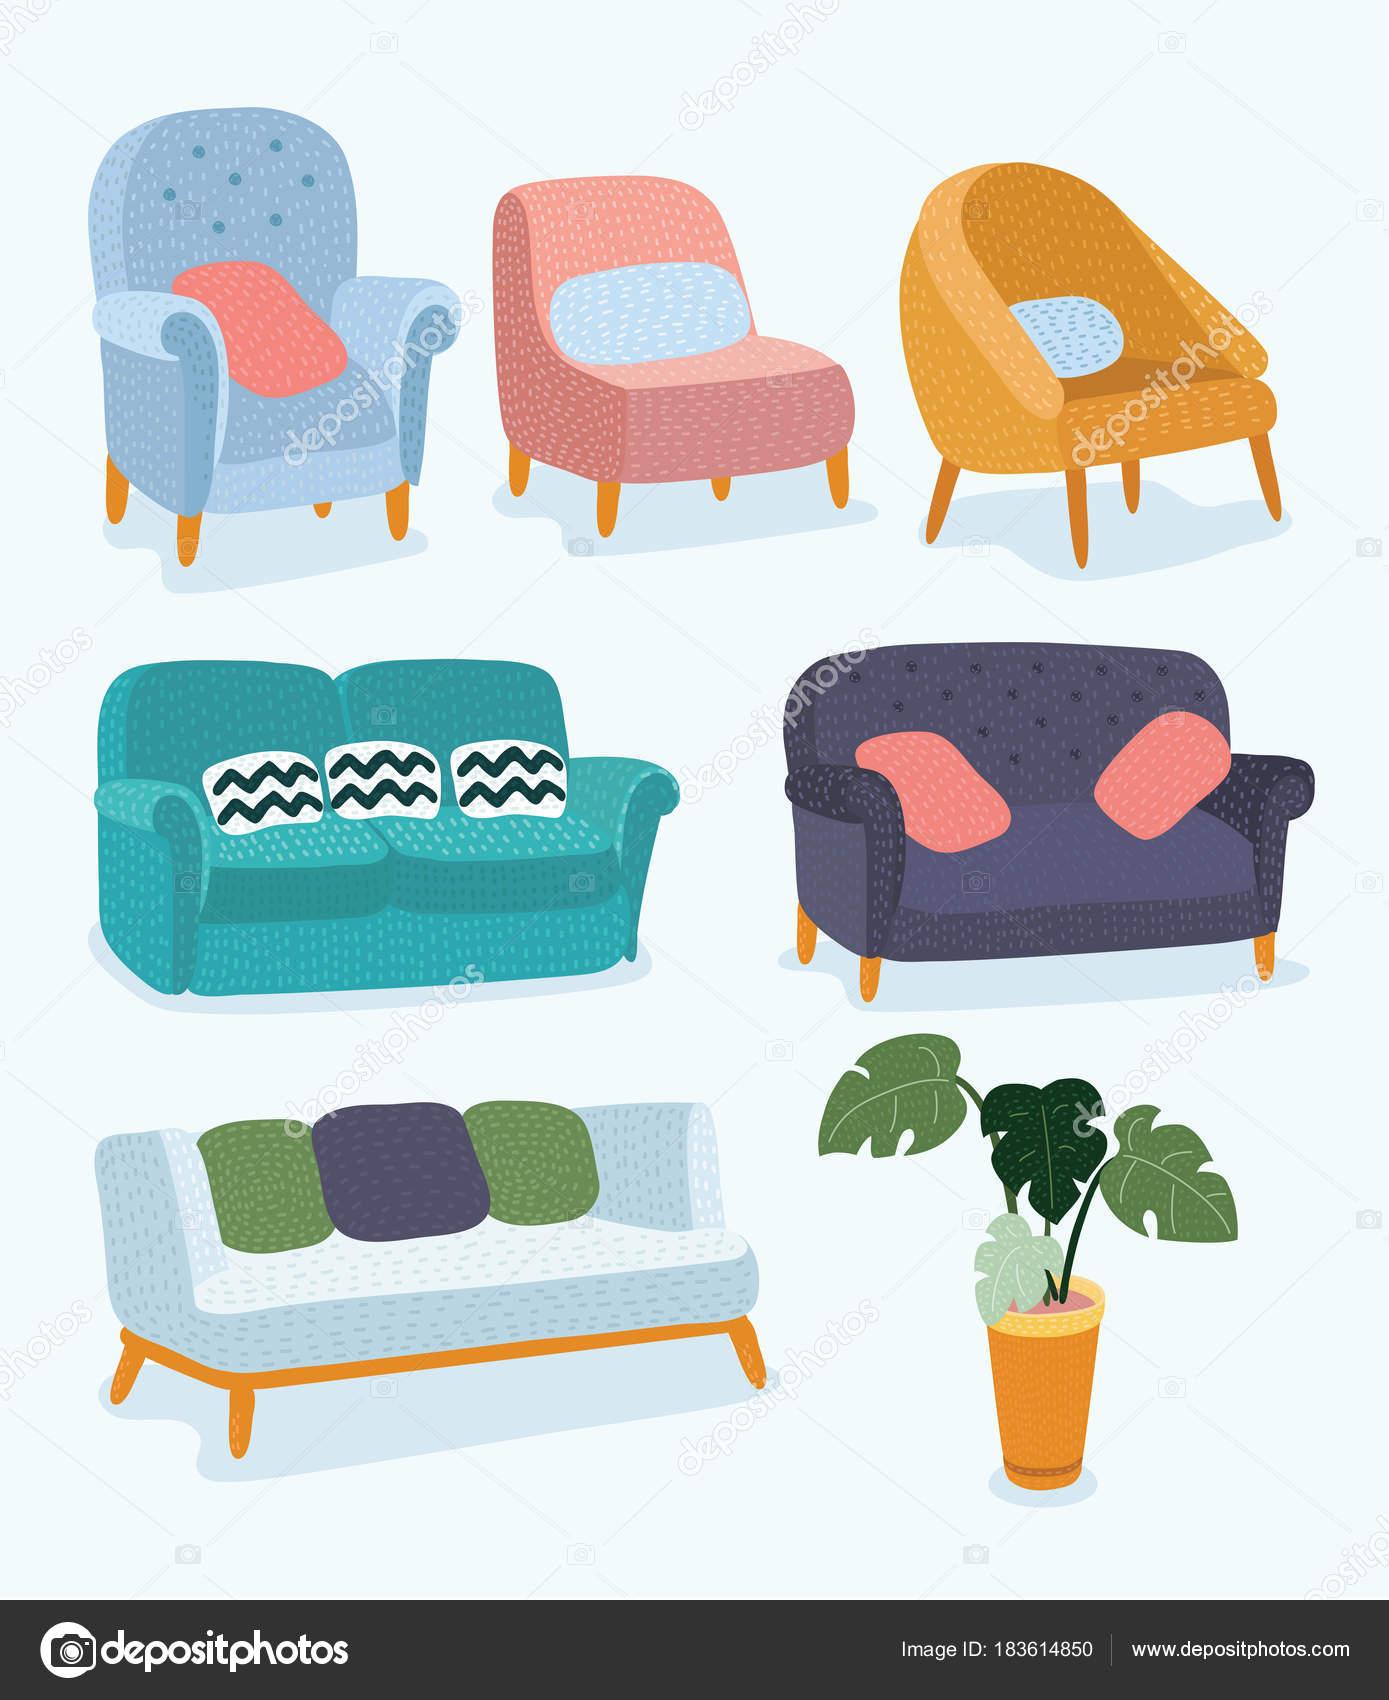 Im genes muebles concepto de dise o de muebles sala de for Disenos de muebles de sala